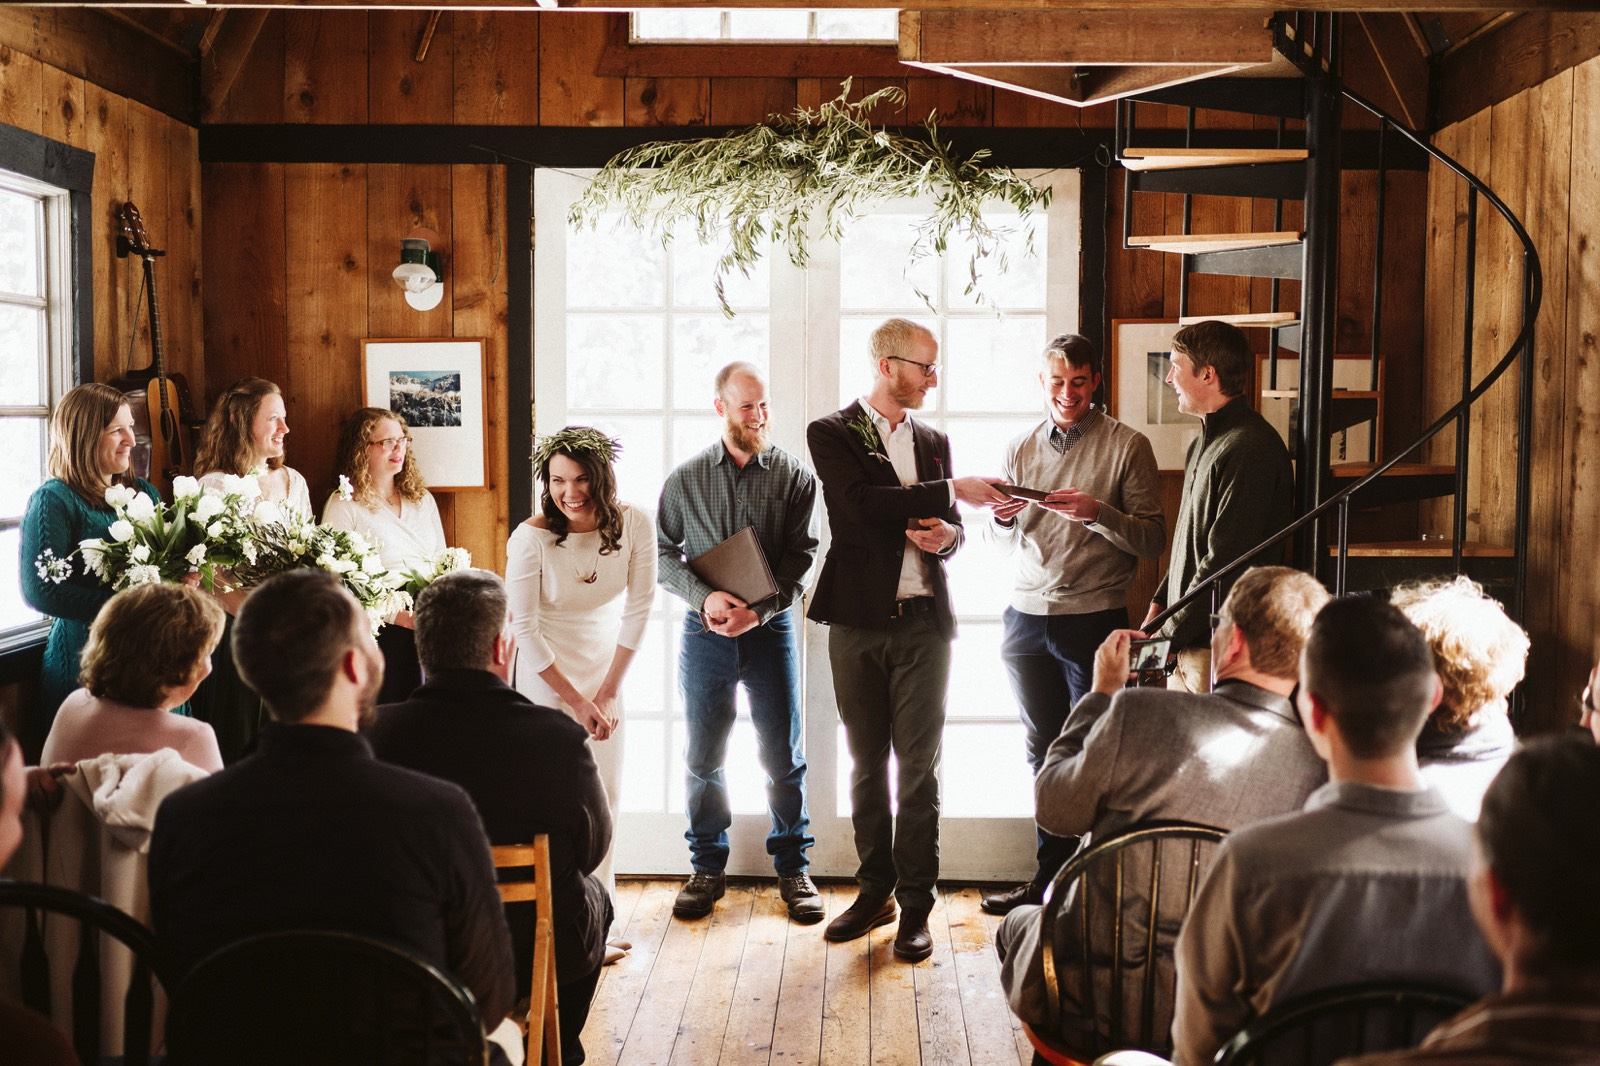 alpine-lakes-high-camp-winter-wedding-37 ALPINE LAKES HIGH CAMP WEDDING